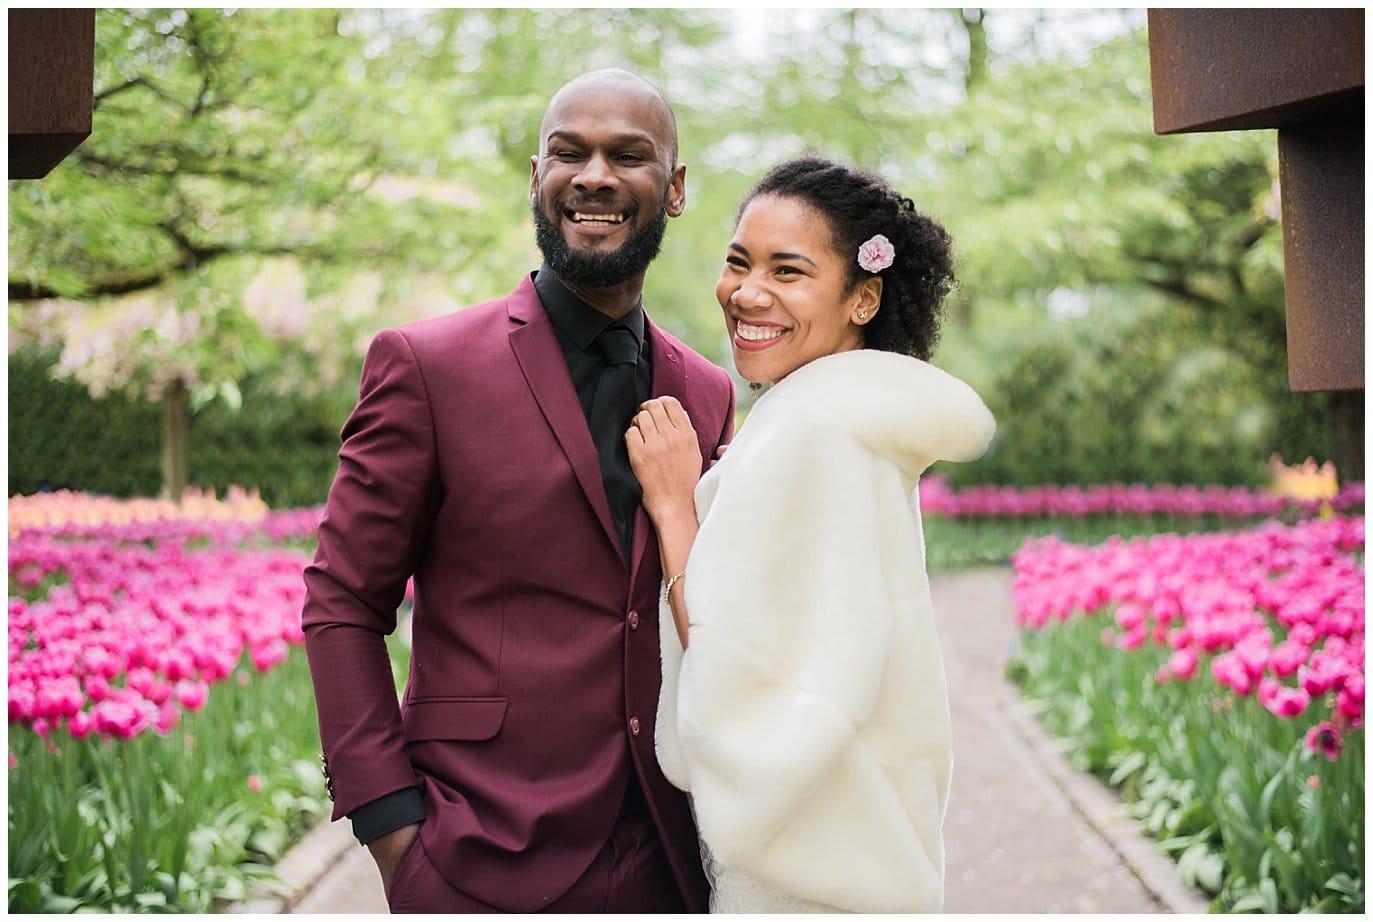 bride and groom in dutch tulip garden photo